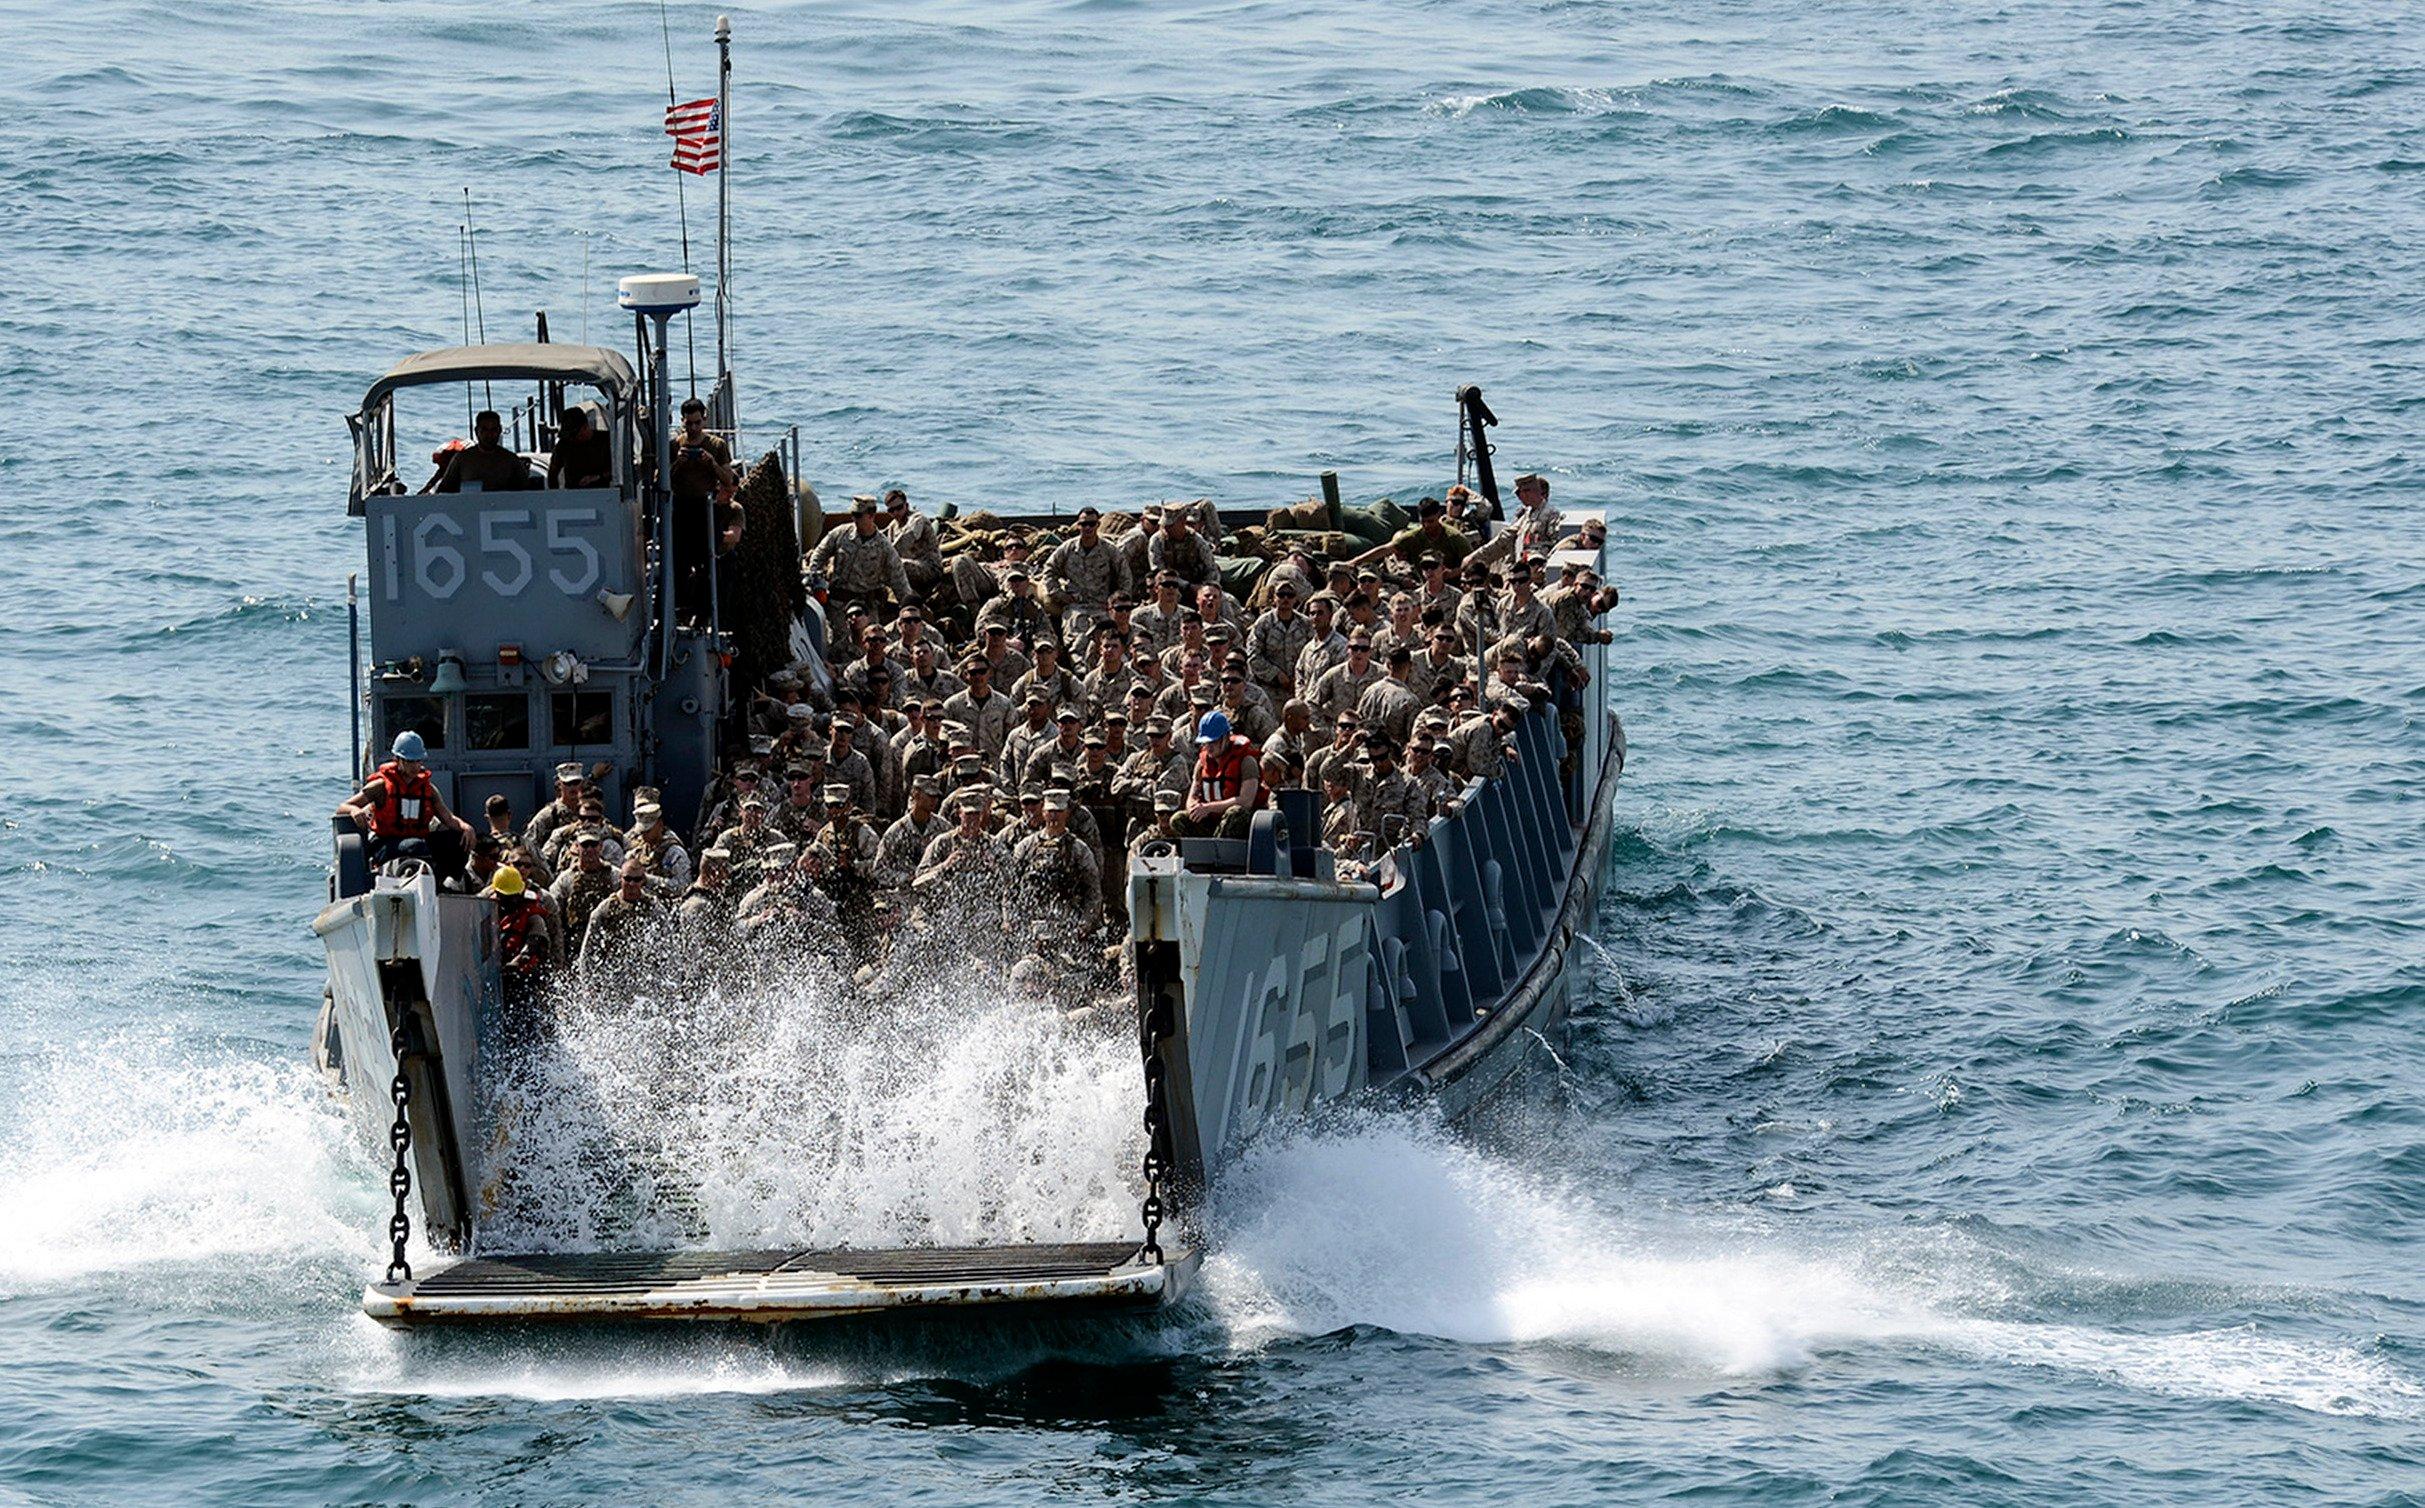 Marines aboard Landing Craft Utility (LCU) 1655 approach the well deck of the amphibious assault ship USS Bataan (LHD-5) on Aug. 22, 2014. US Navy Photo